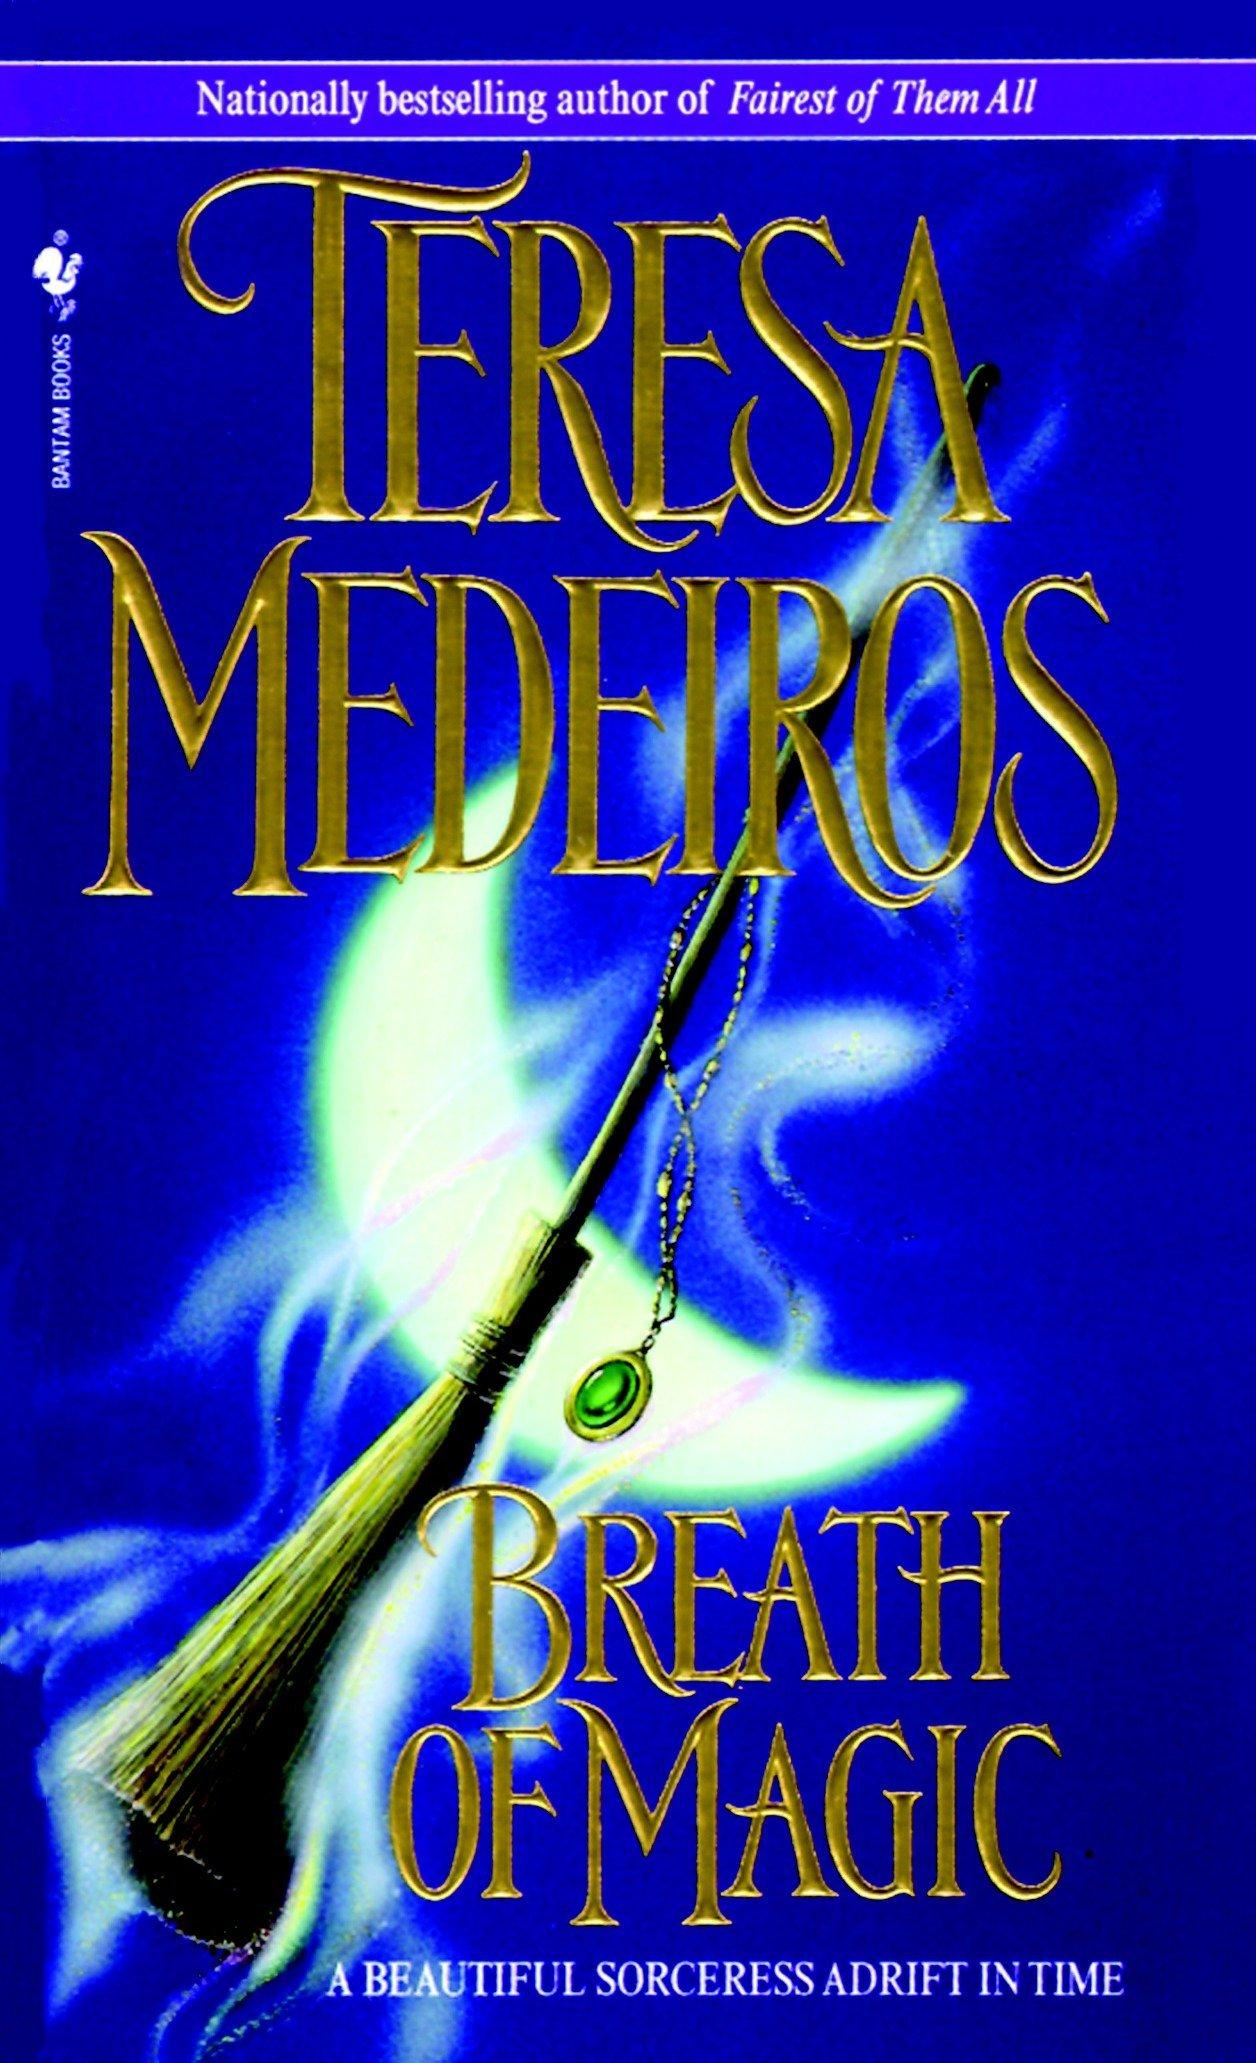 Amazon.com: Breath of Magic: A Novel (Lennox Family Magic) (8601400274422): Teresa  Medeiros: Books